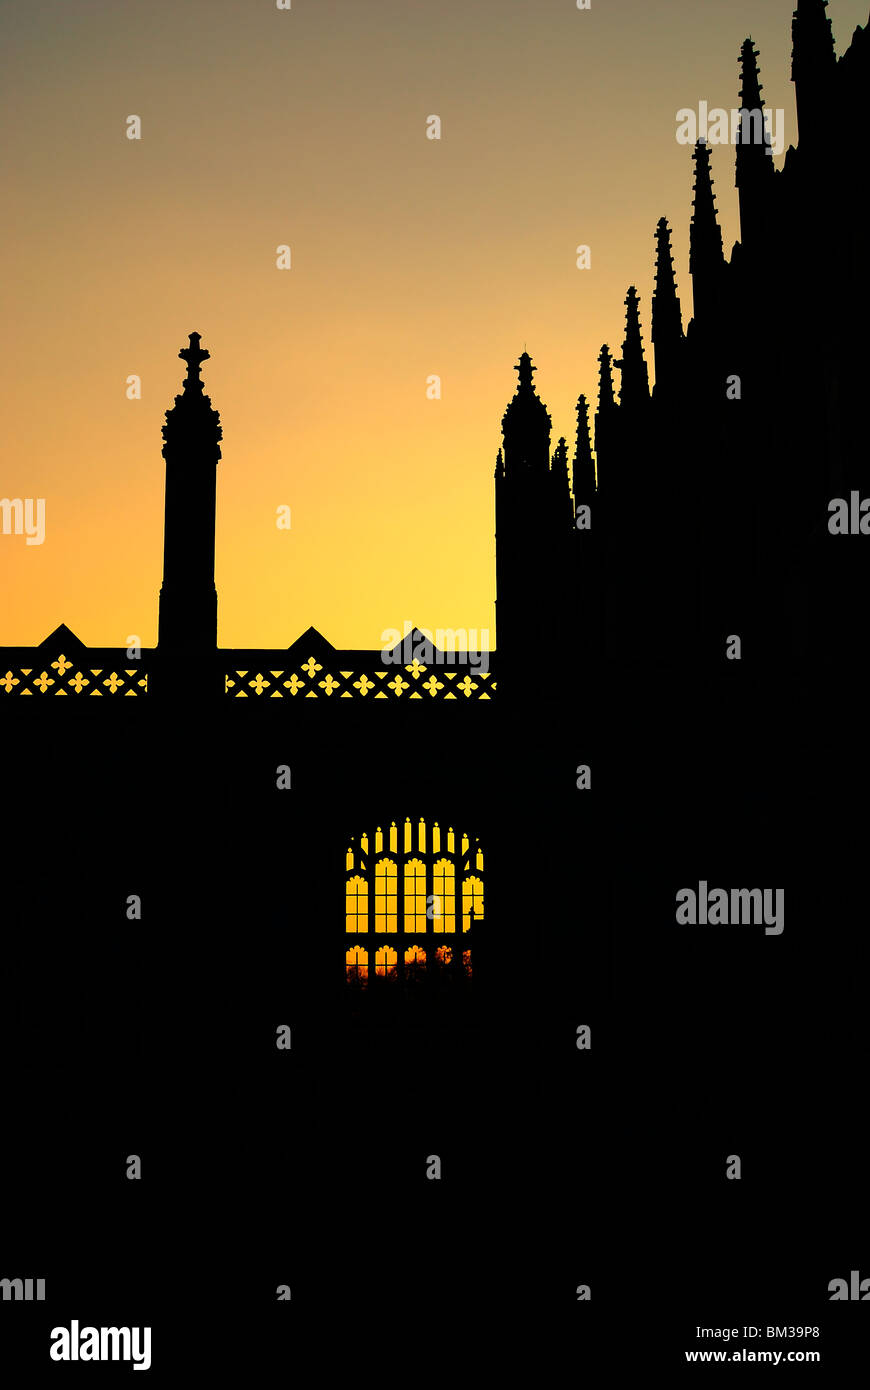 Kings College Cambridge University Silhouette - Stock Image